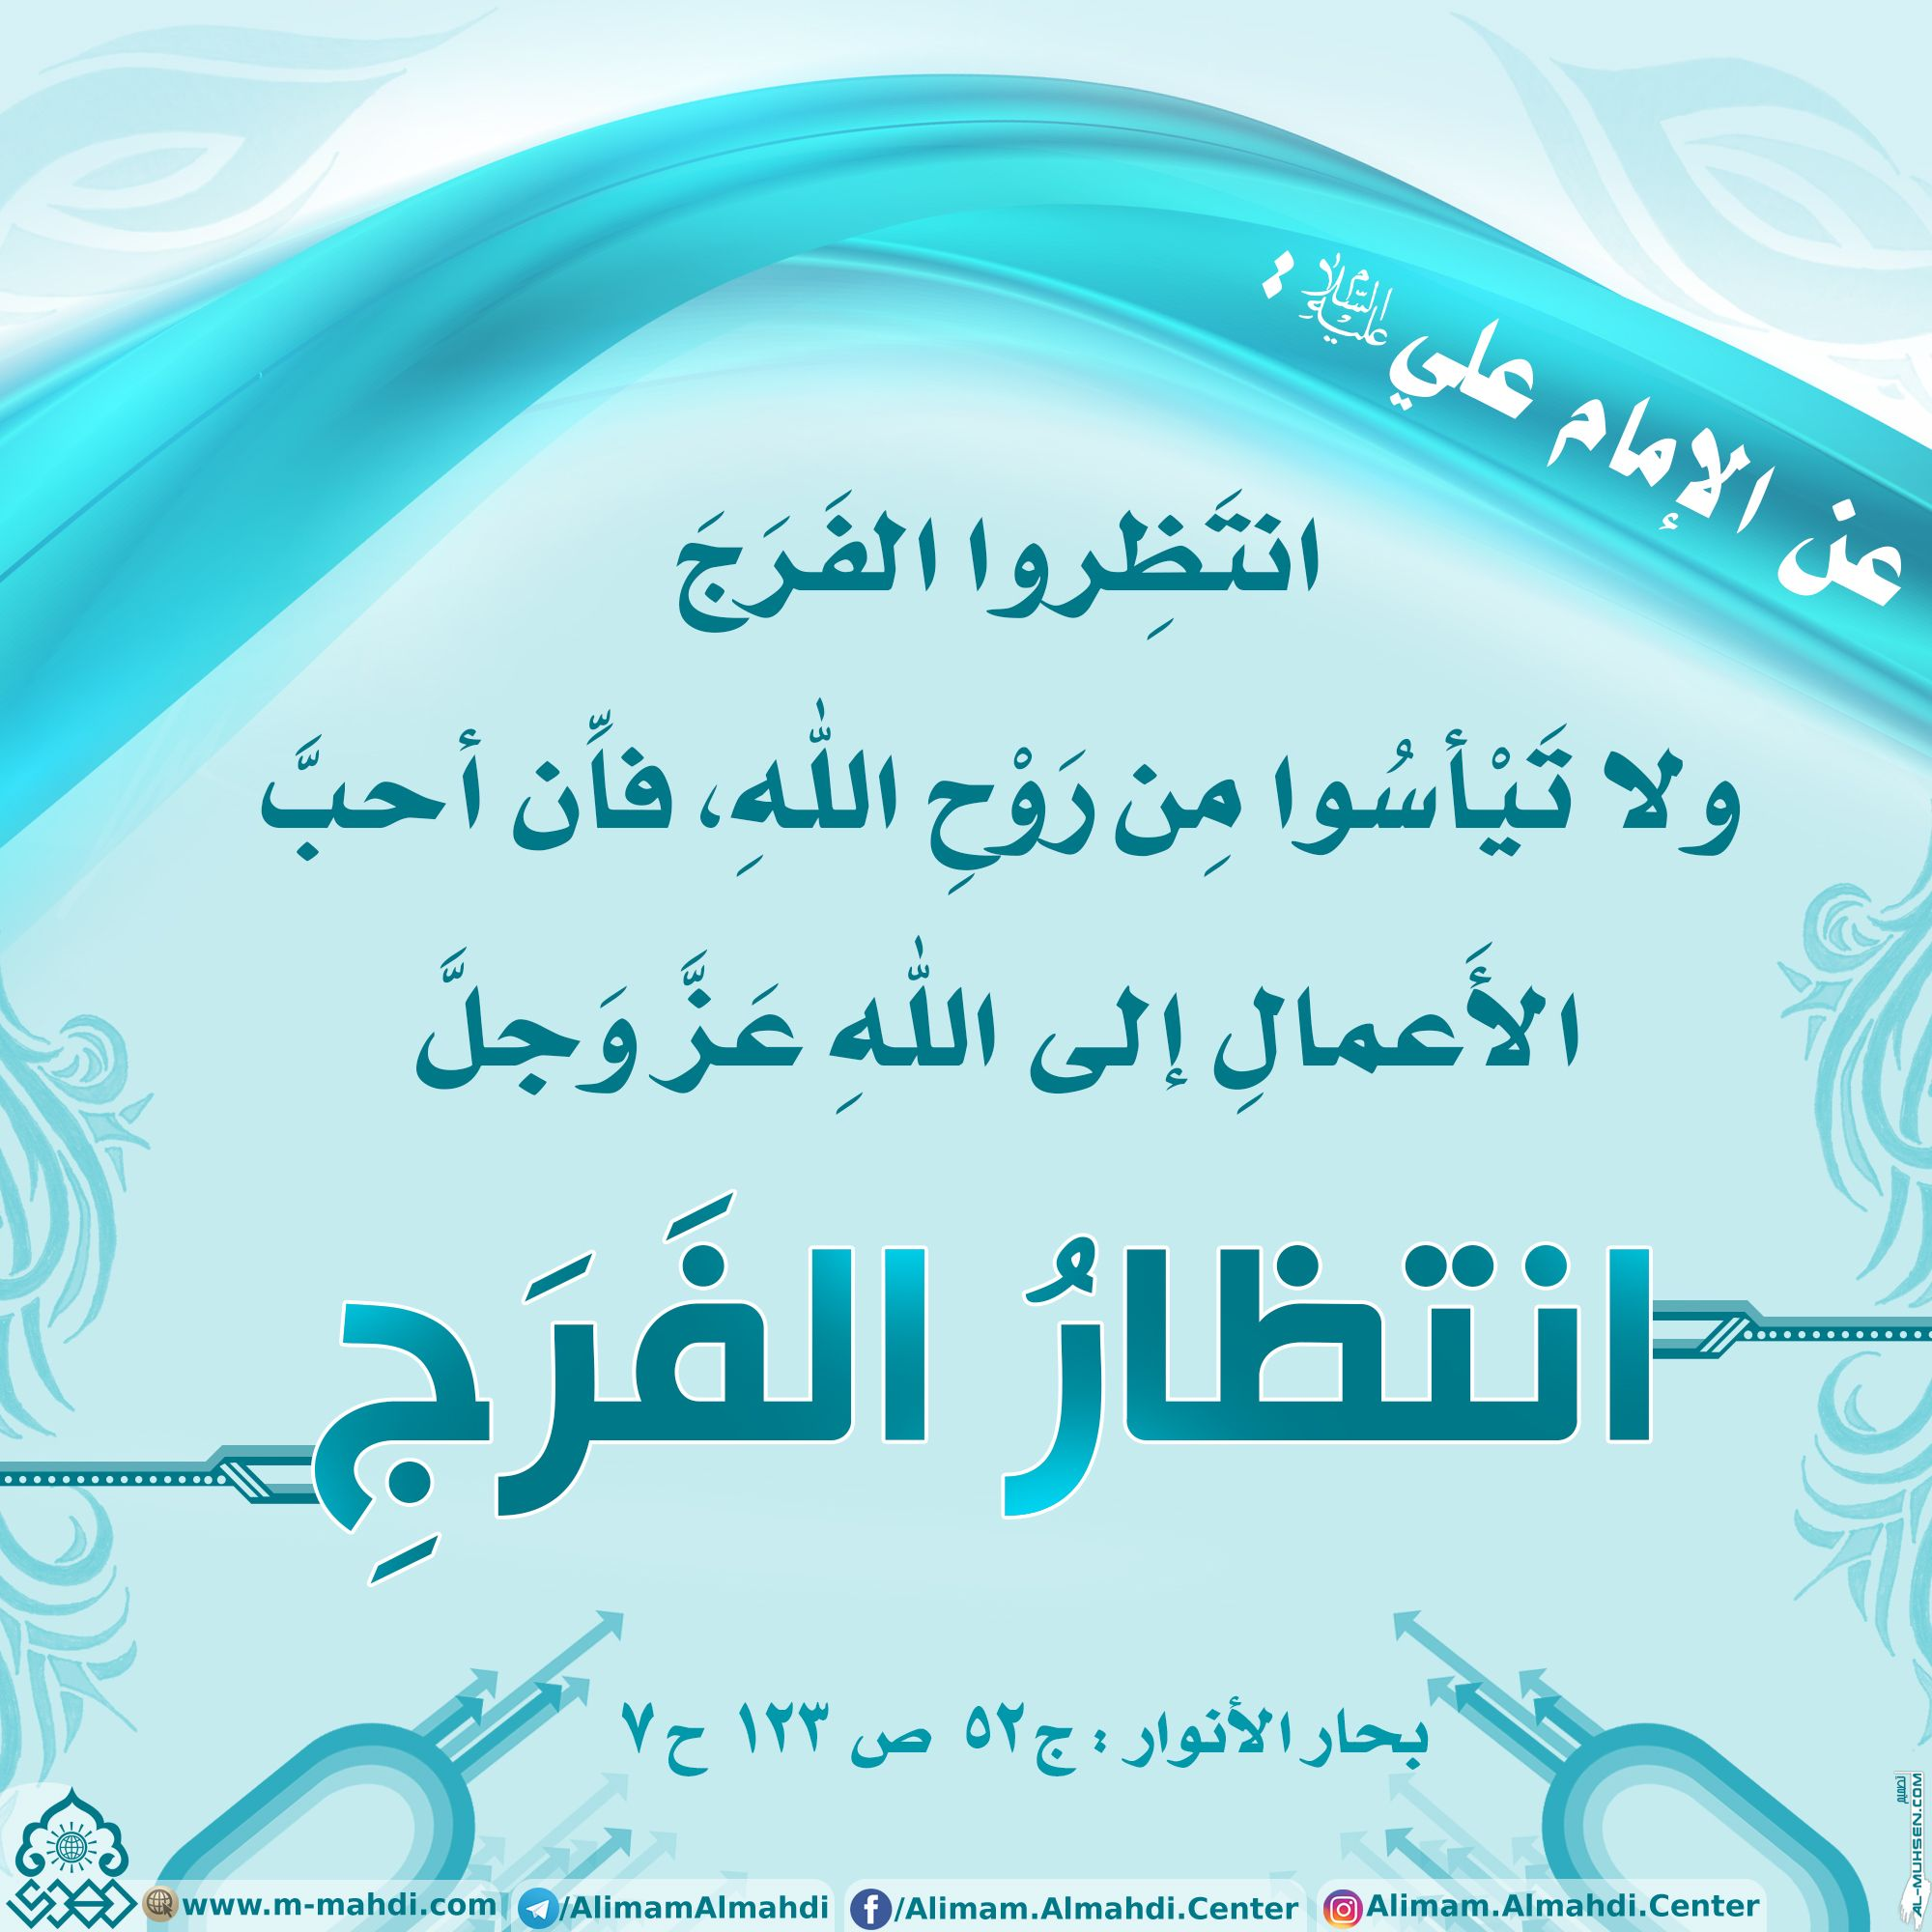 أحاديث مهدوية Arabic Love Quotes Love Quotes Islamic Art Calligraphy